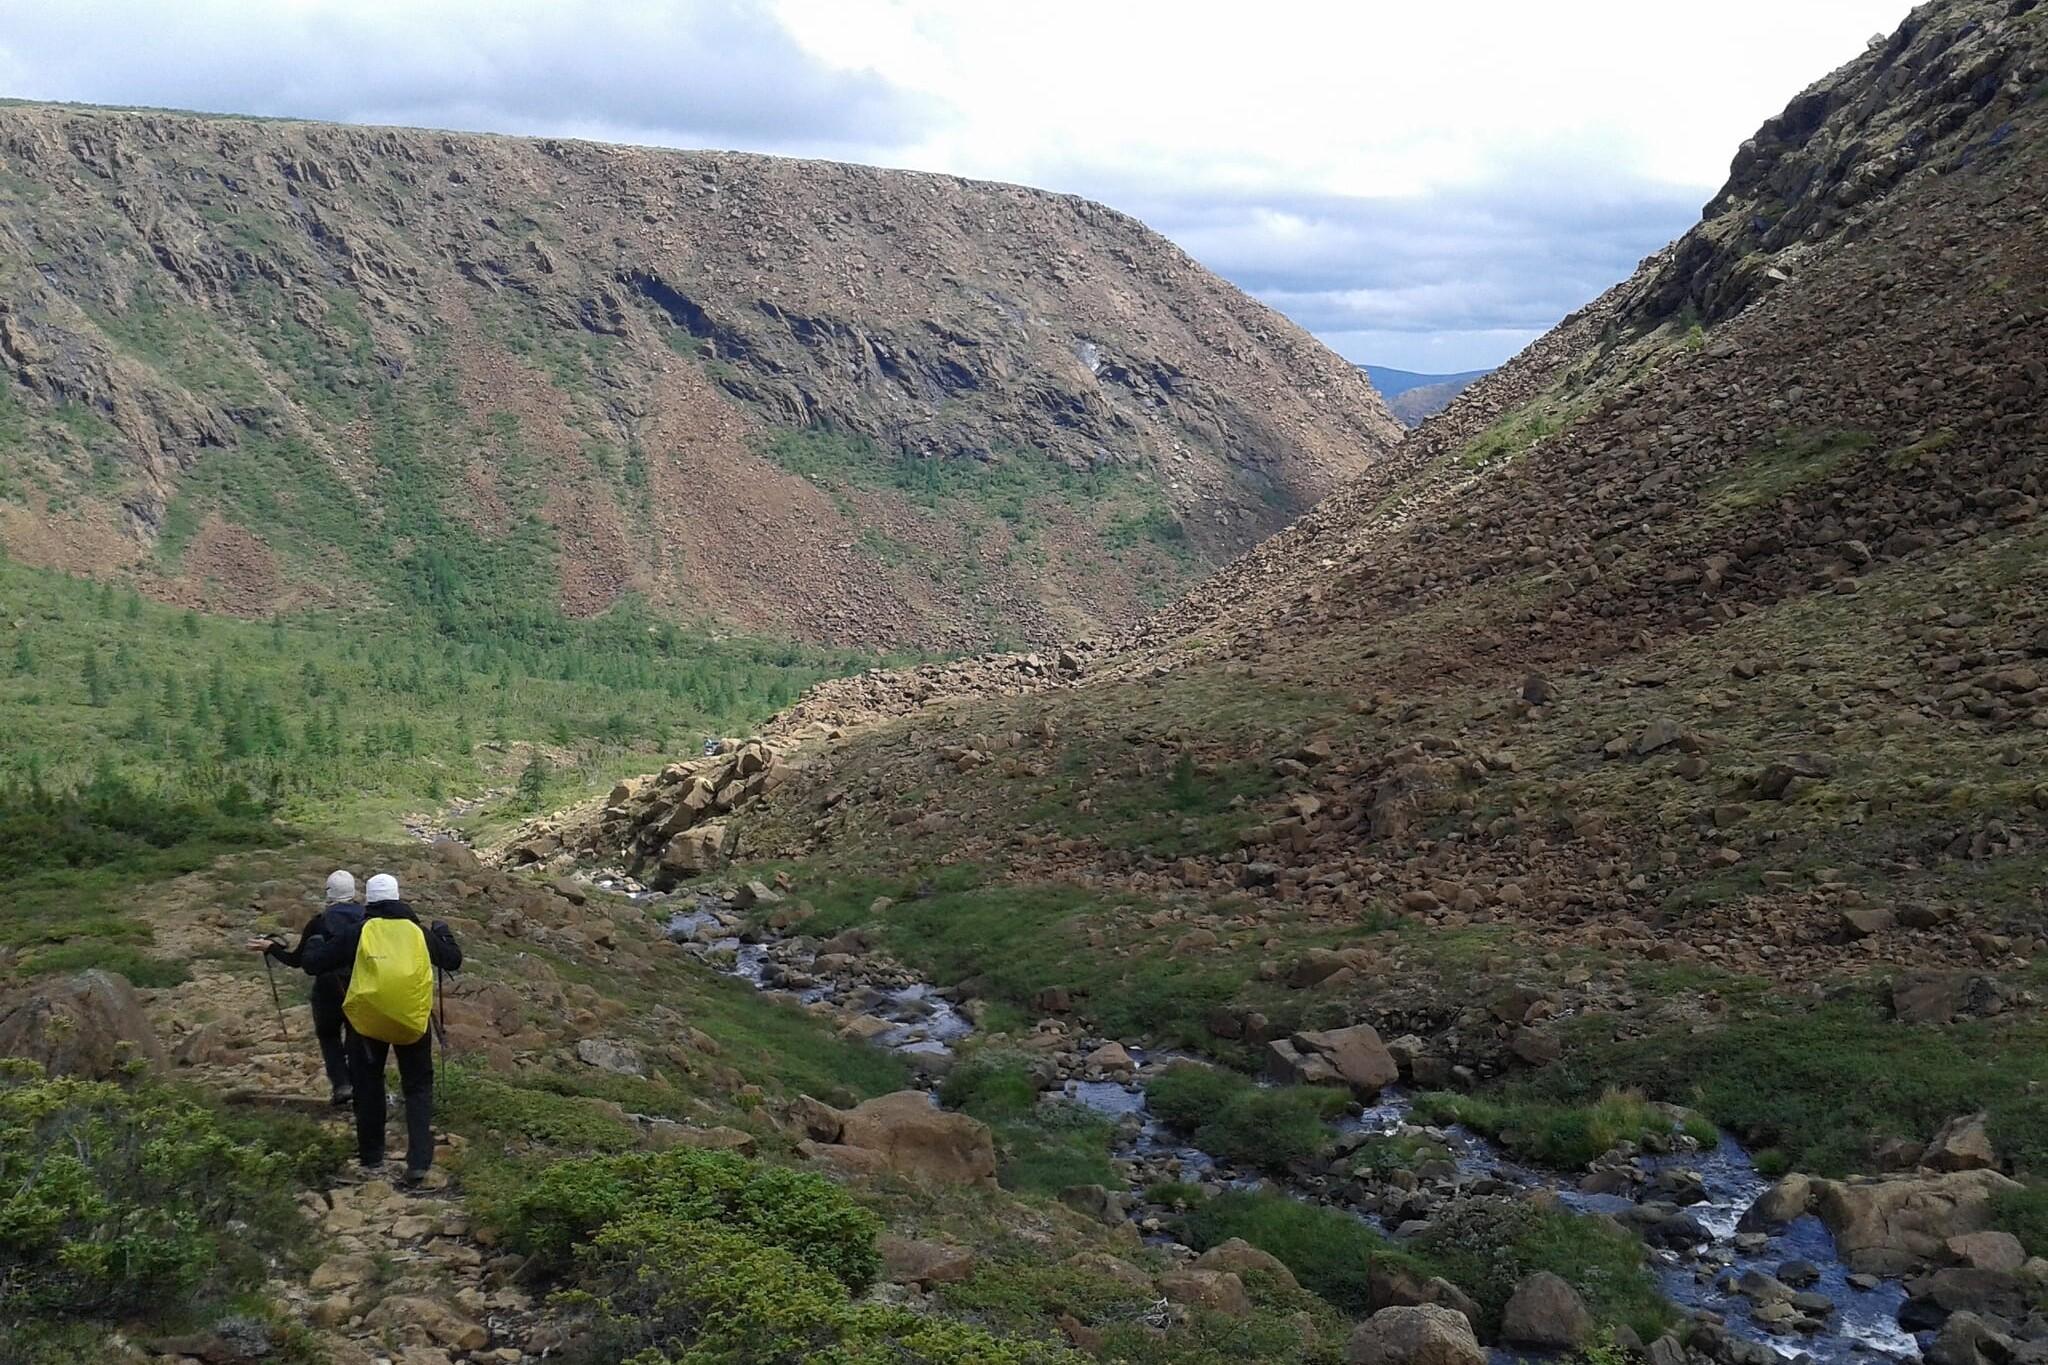 People hiking on the International Appalachian Trail